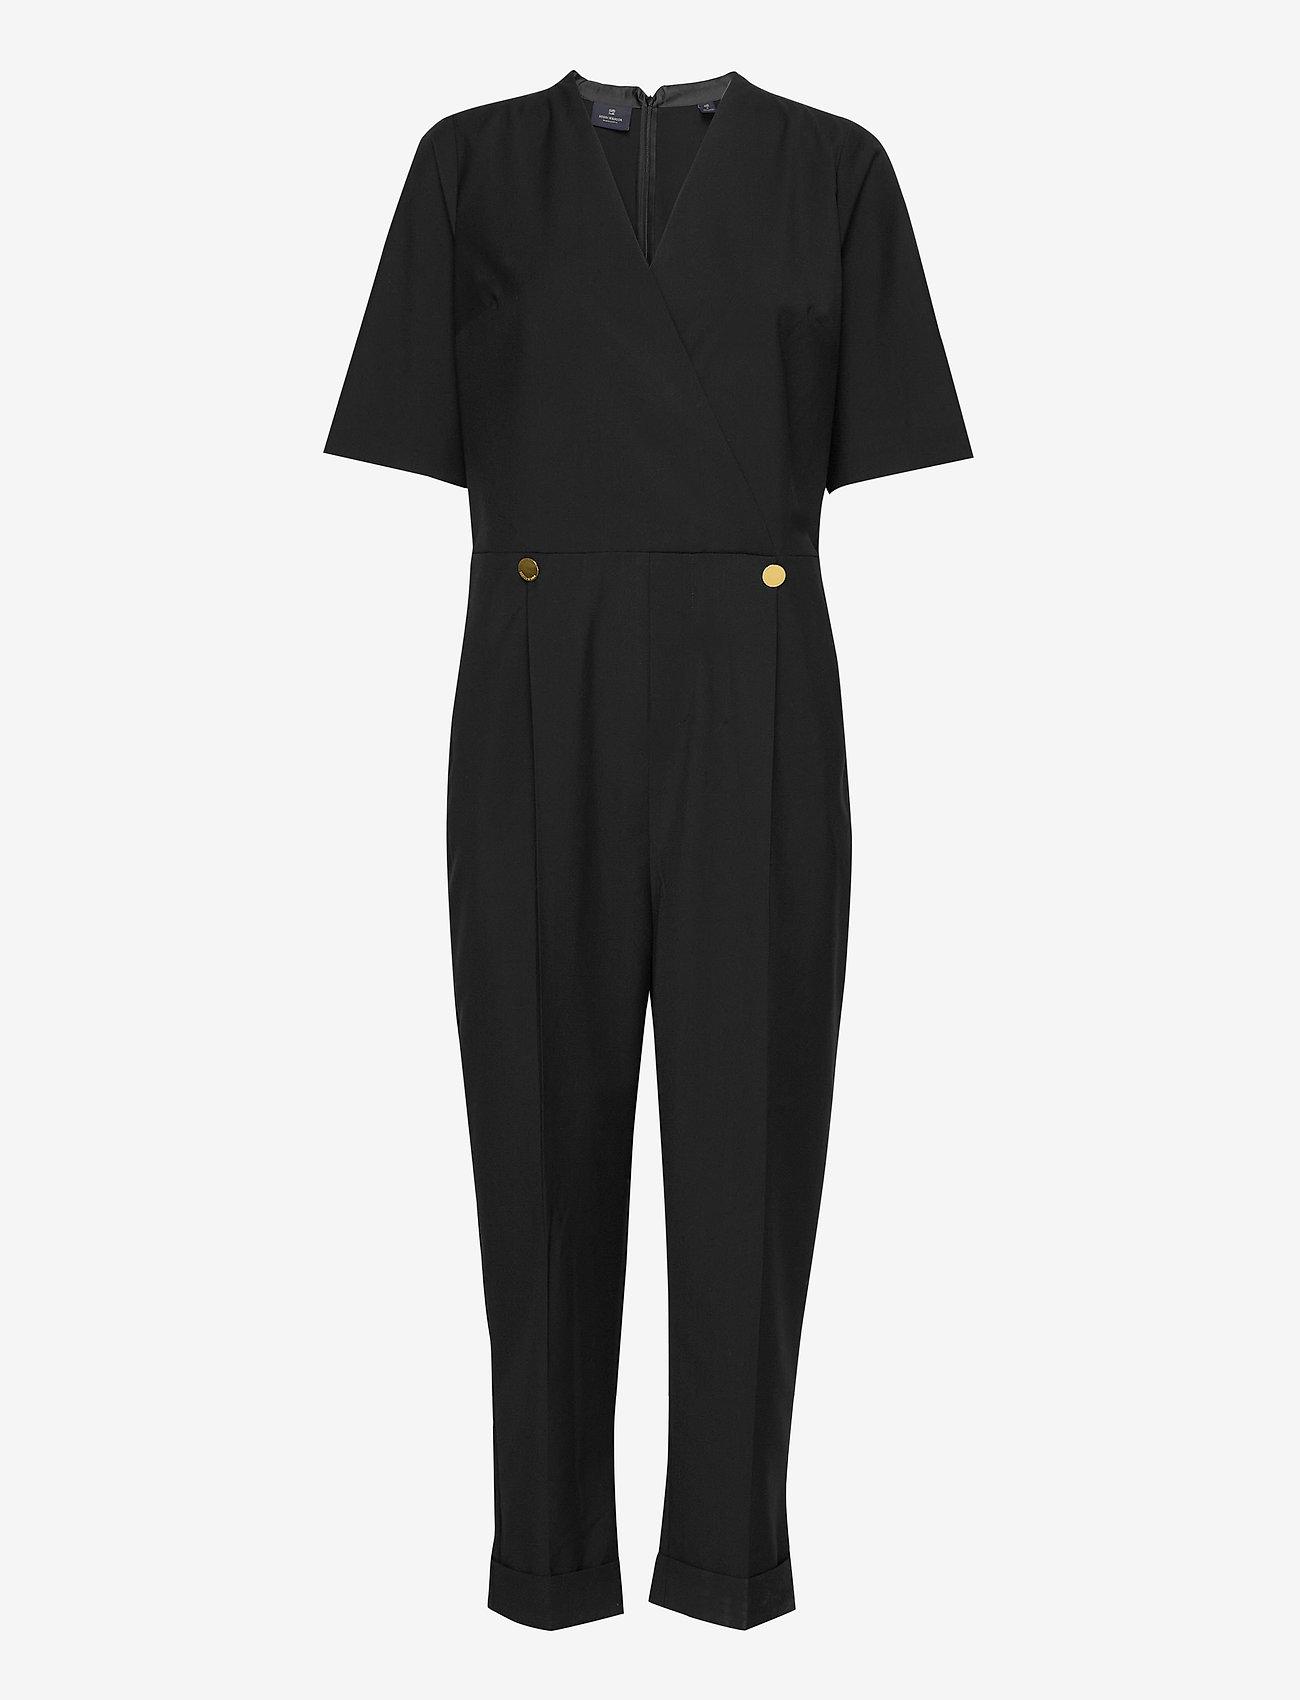 Scotch & Soda - Clean tailored all in one - jumpsuits - black - 1